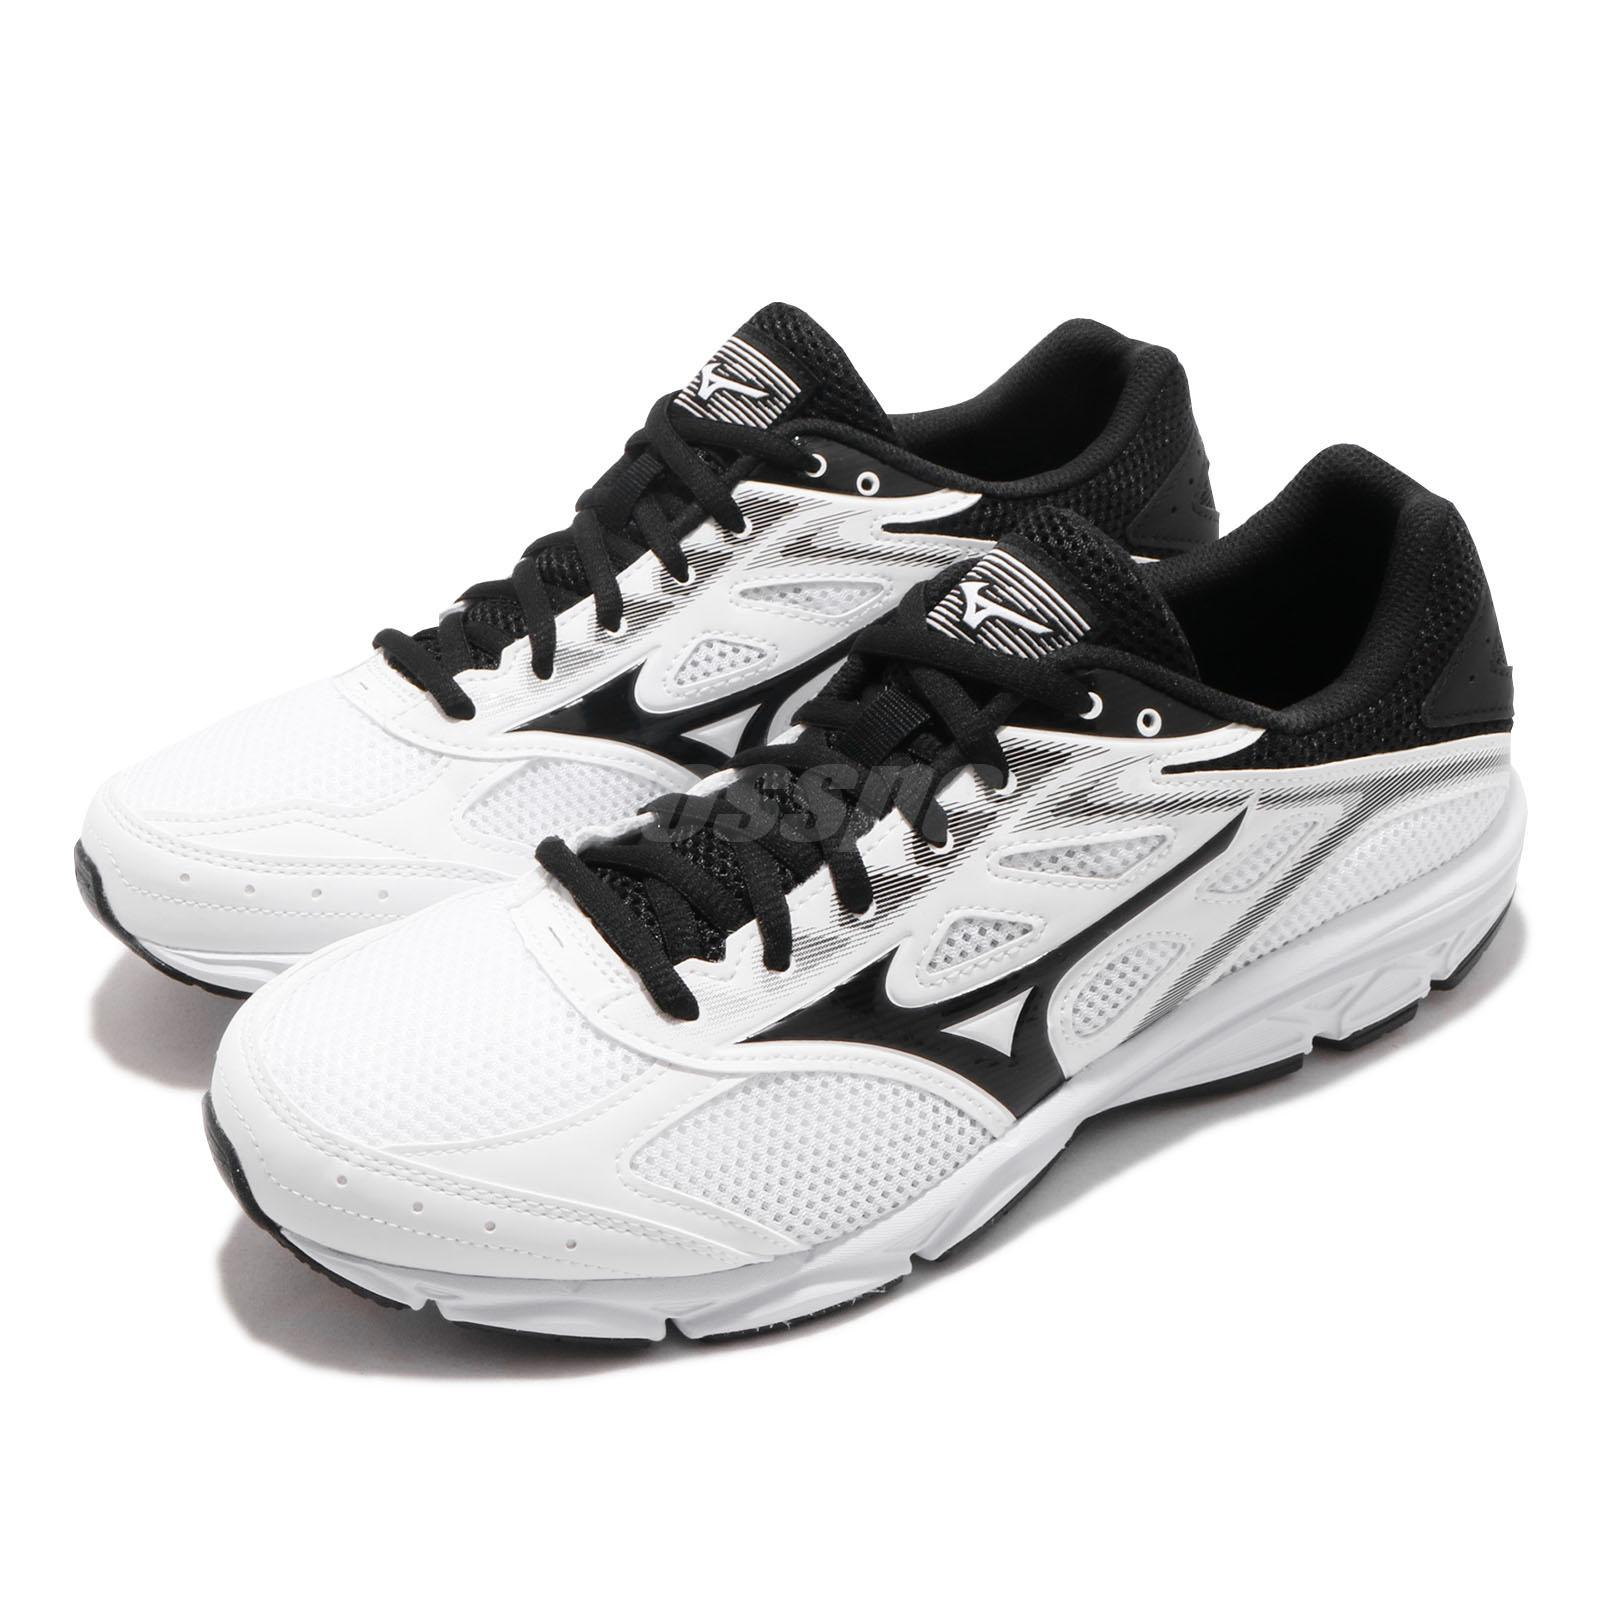 mizuno tennis shoes size chart espa�a en argentina fit